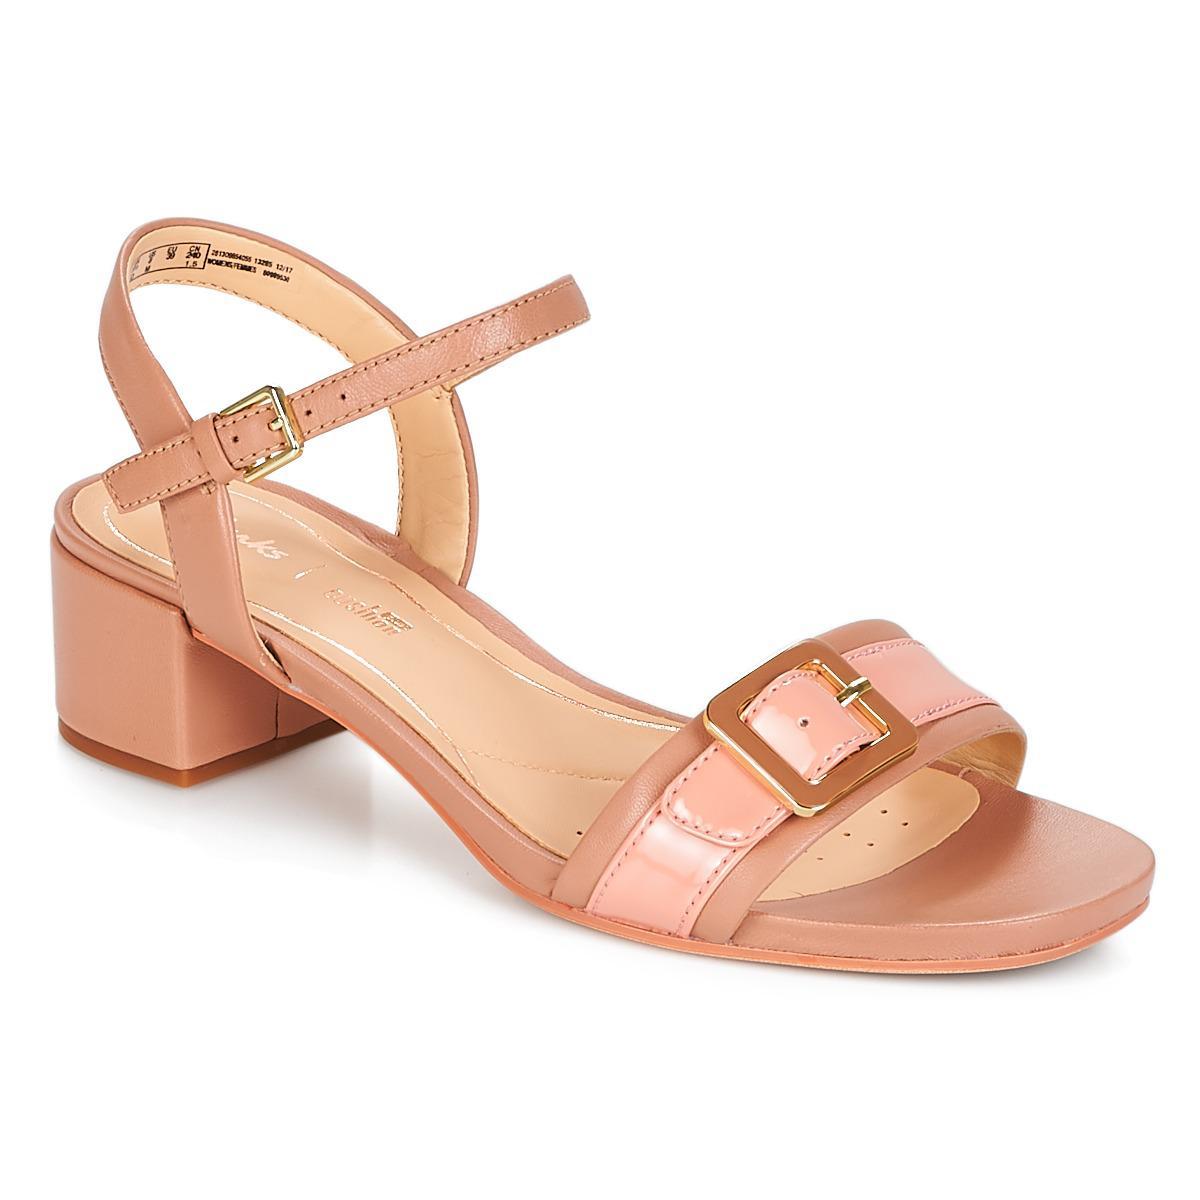 best deals on outlet on sale Official Website Clarks Leather Orabella Shine Sandals in Pink - Lyst